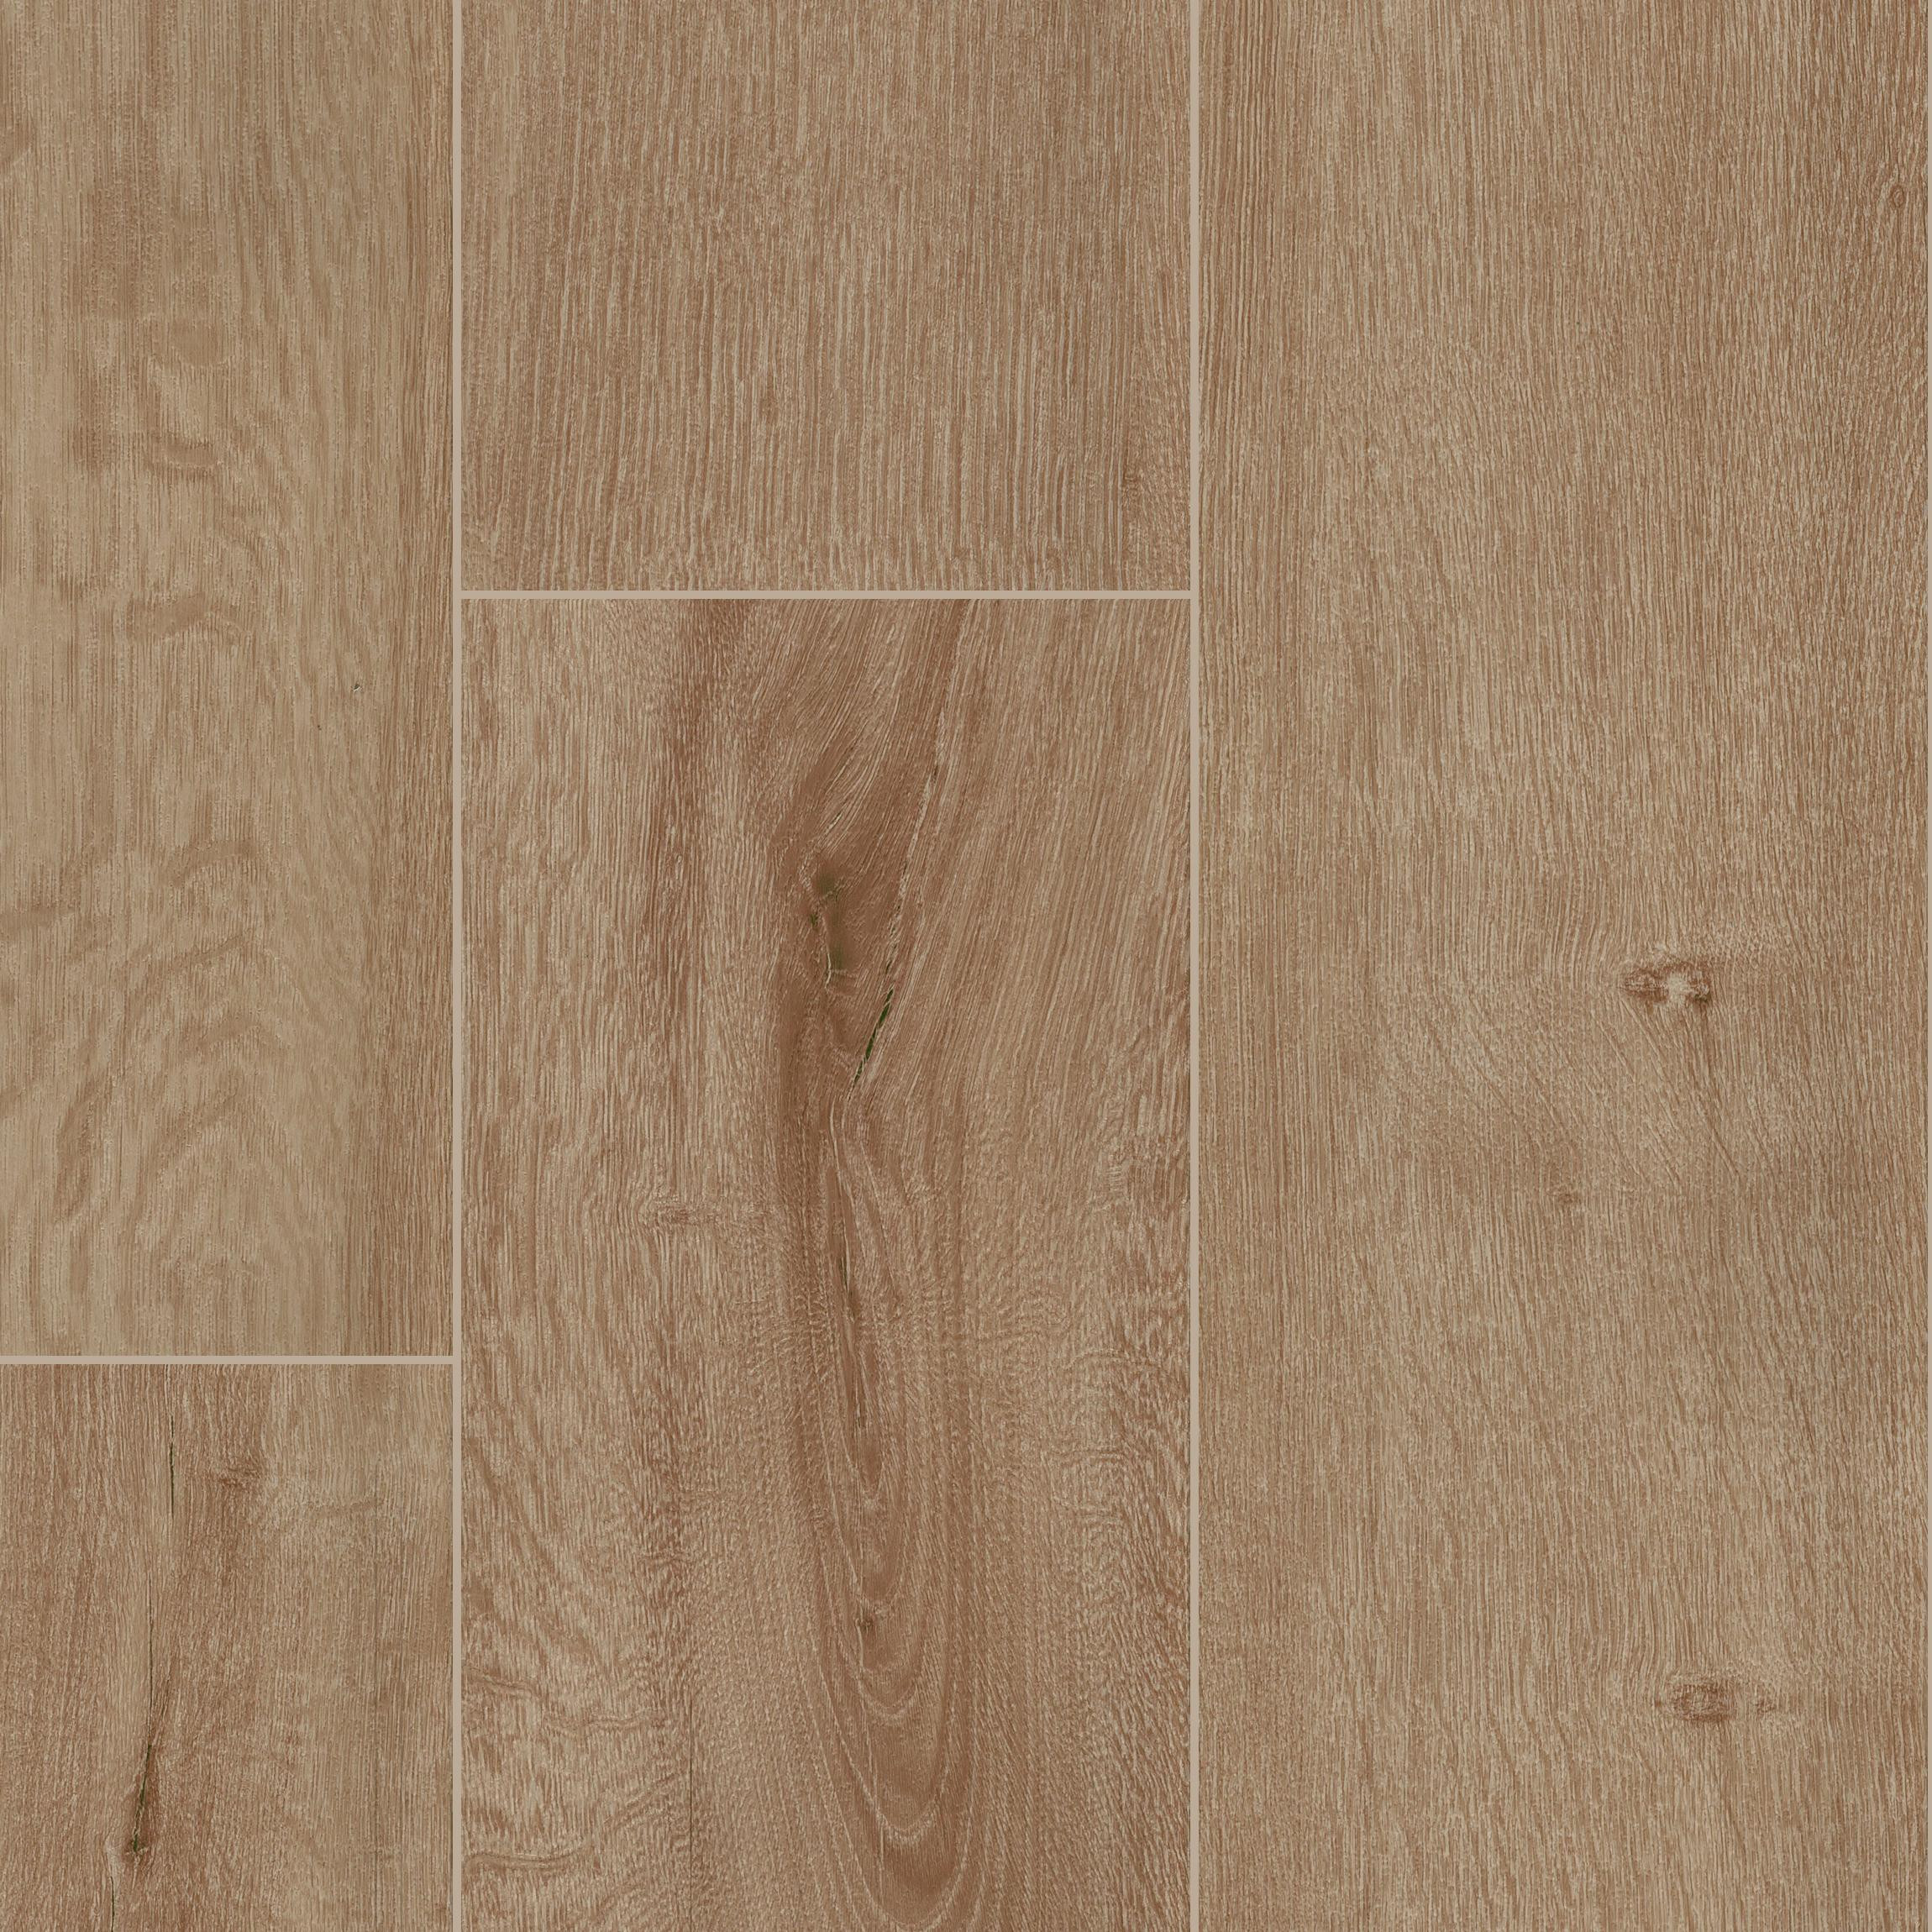 30 Lovable How to Install Glue Down Hardwood Floors 2021 free download how to install glue down hardwood floors of mohawk beach beige 9 wide glue down luxury vinyl plank flooring within file 462 30